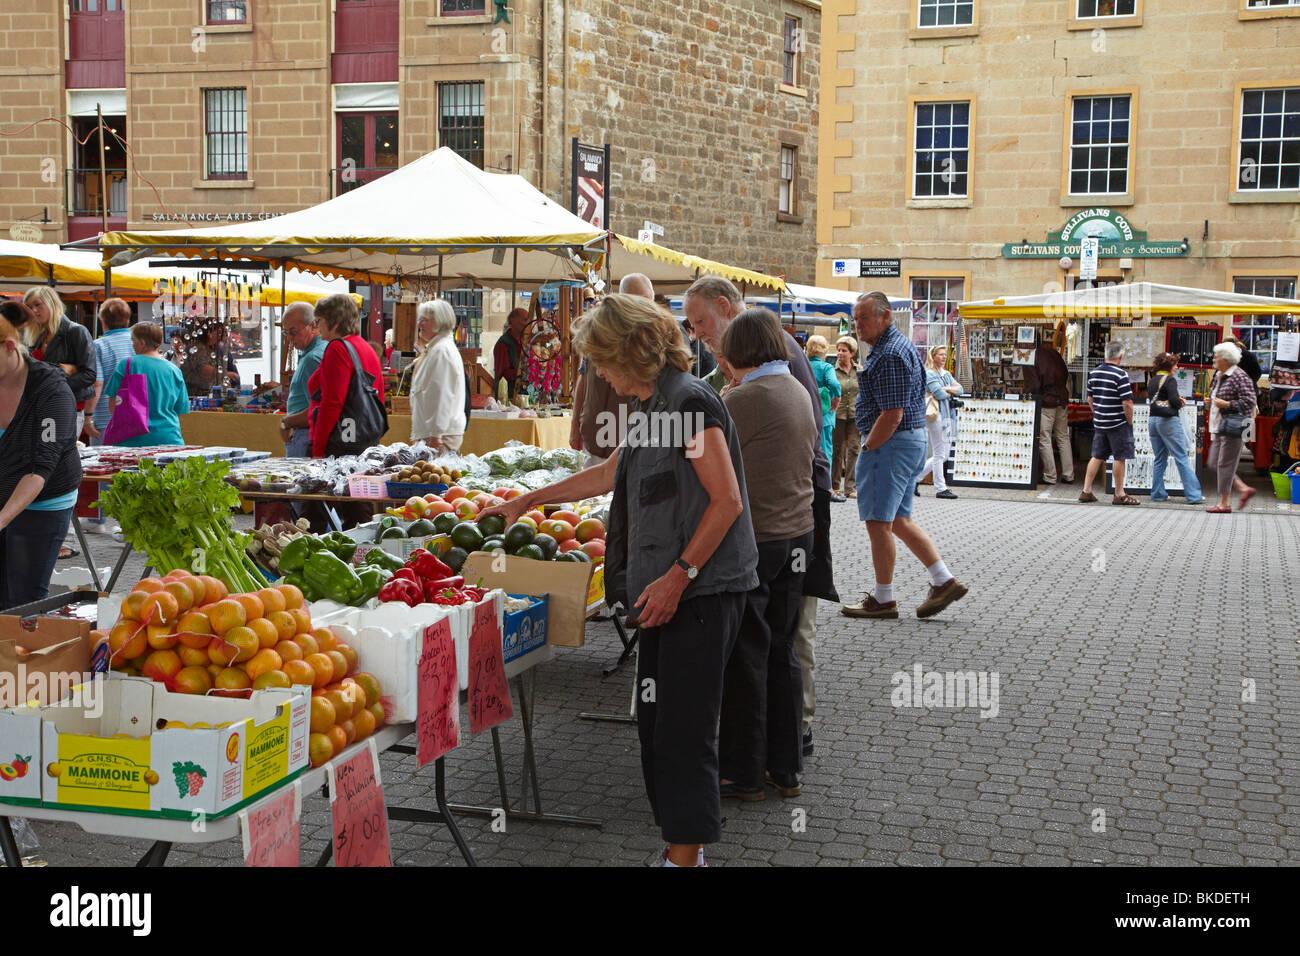 Produce Stall, Saturday Market, Salamanca Place, Hobart, Tasmania, Australia - Stock Image